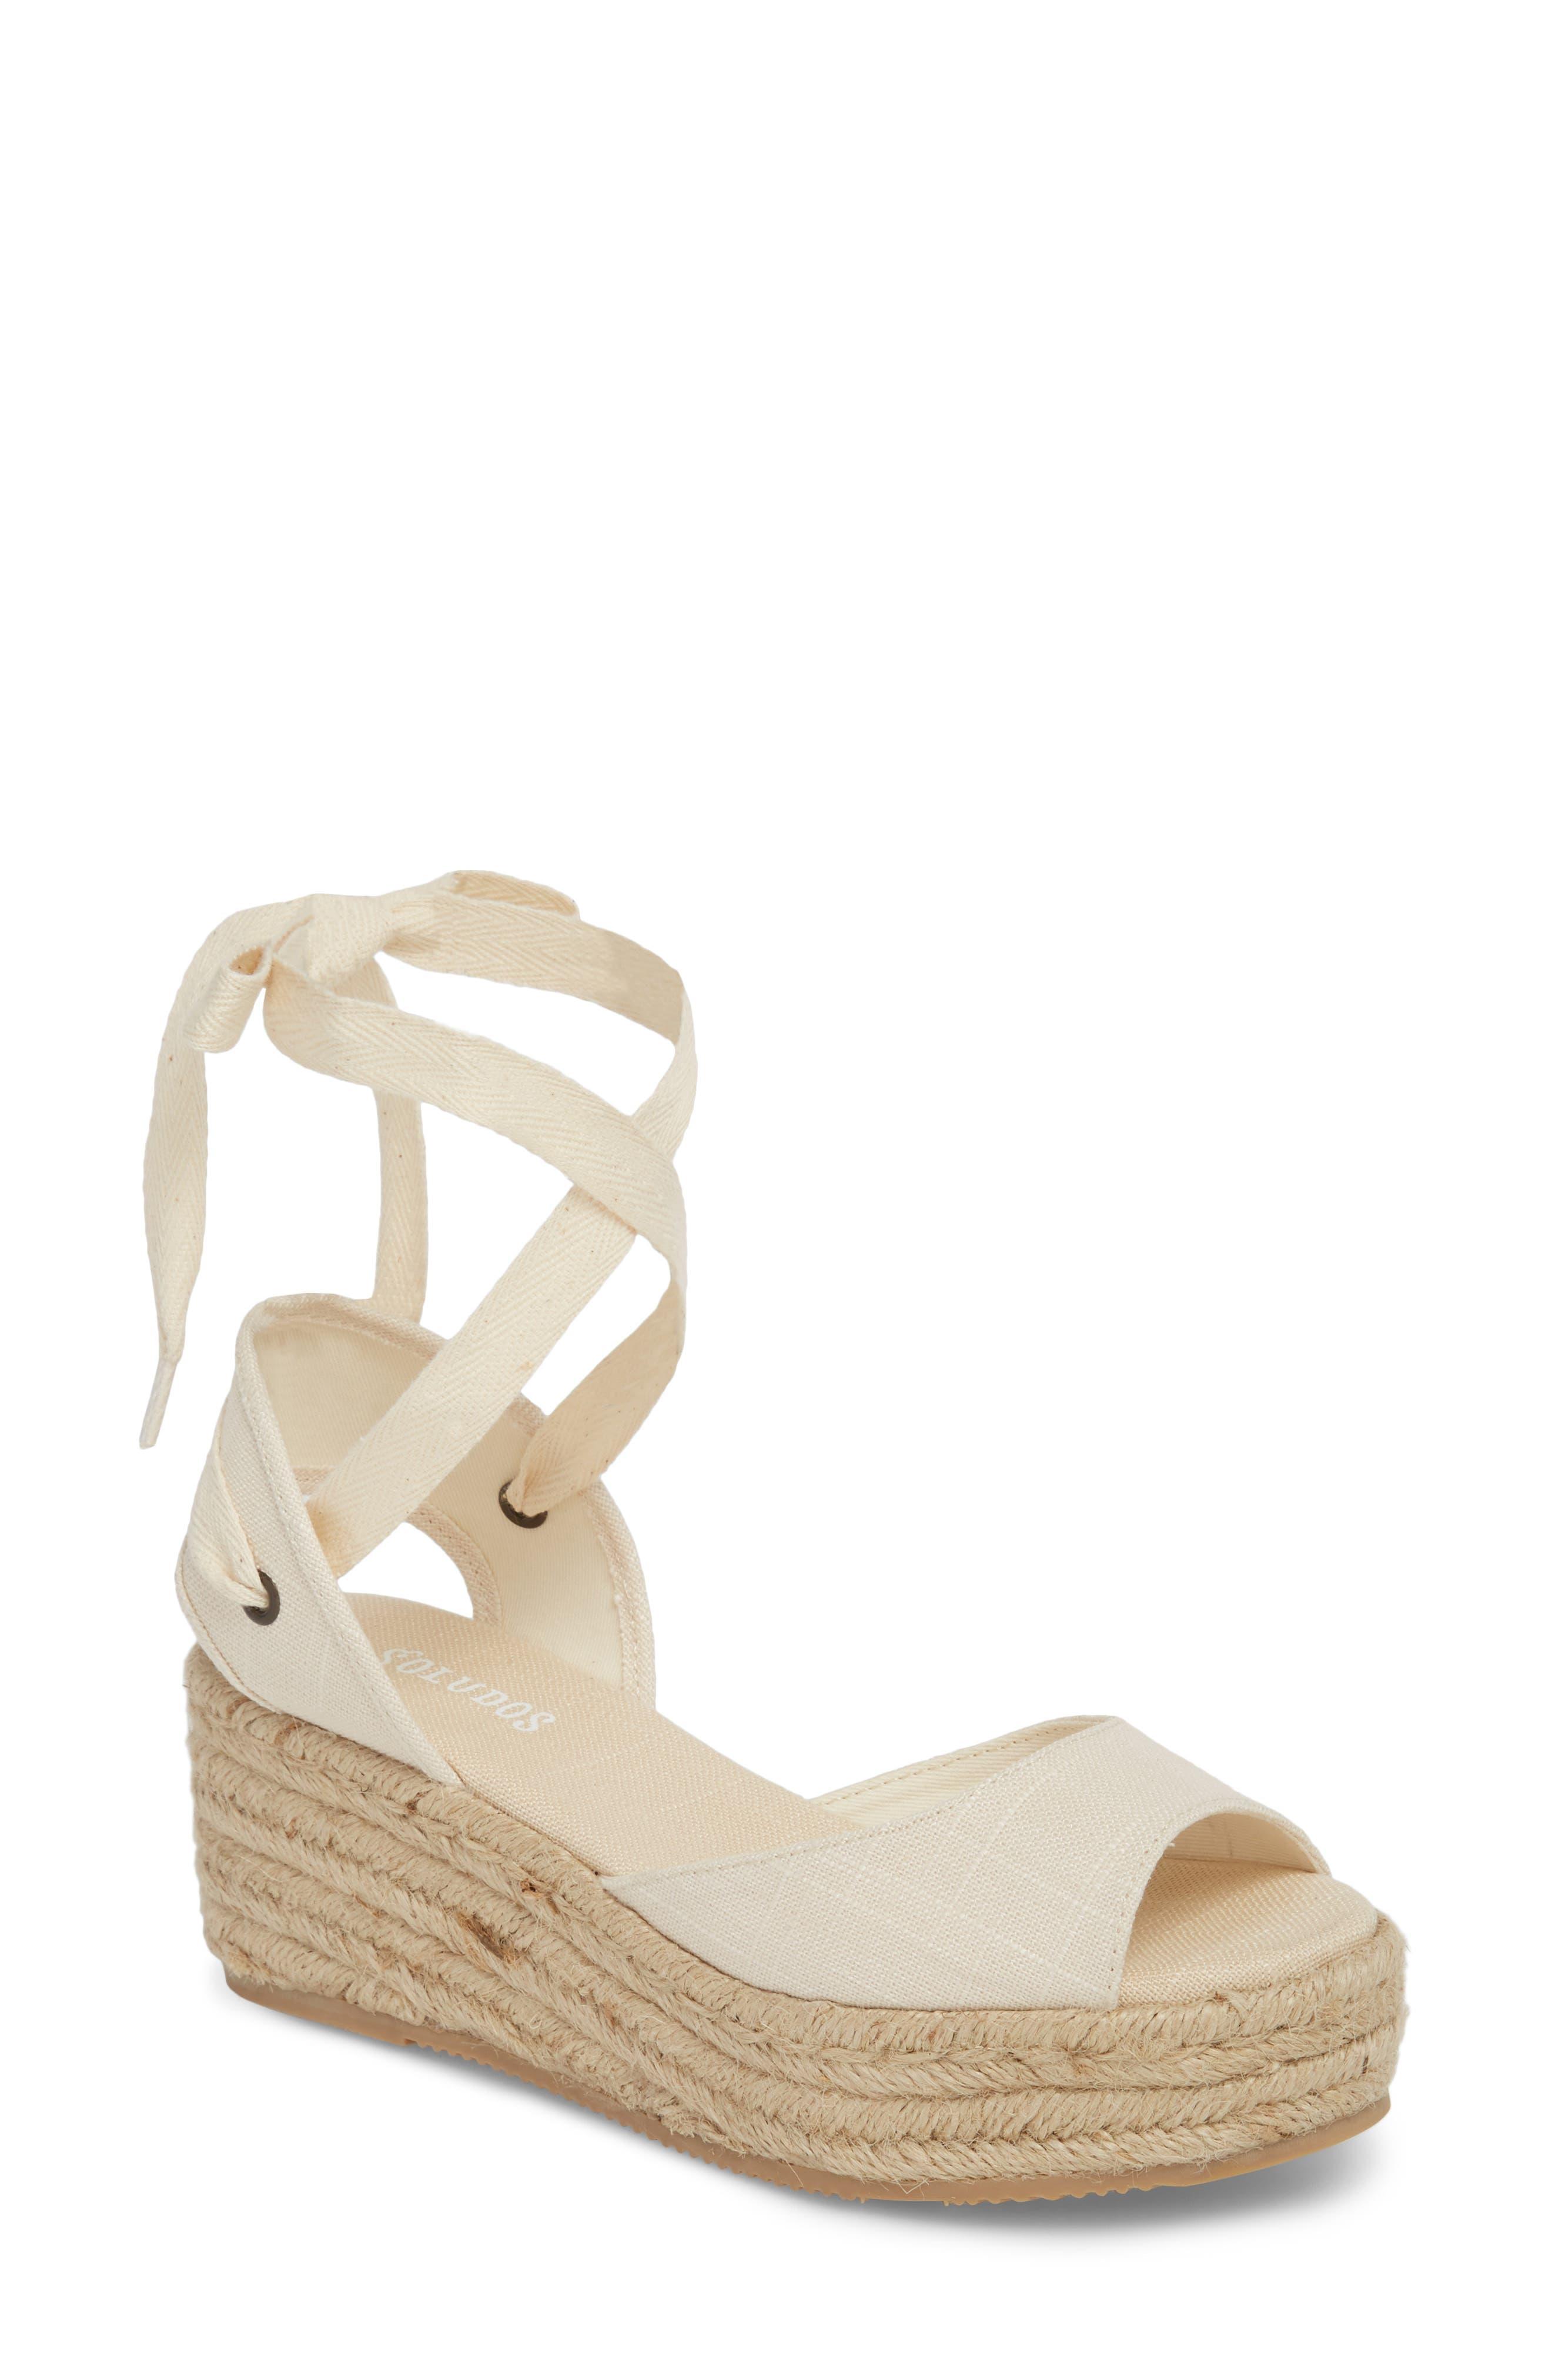 Espadrille Platform Sandal,                         Main,                         color, Blush Fabric